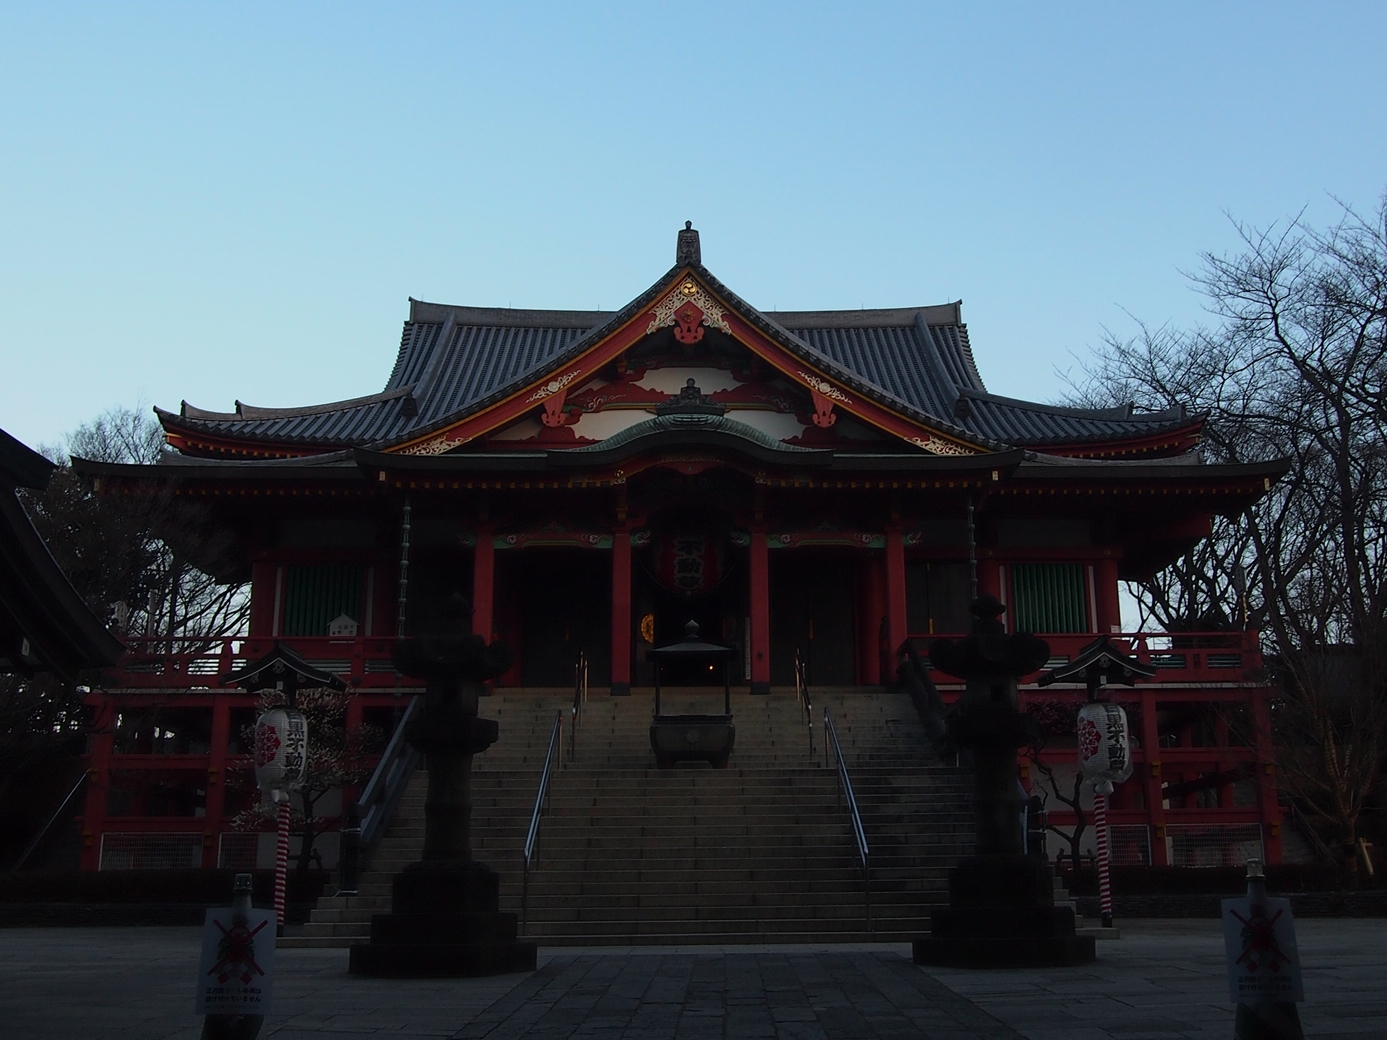 目黒不動尊(龍泉寺)日の出前の本堂